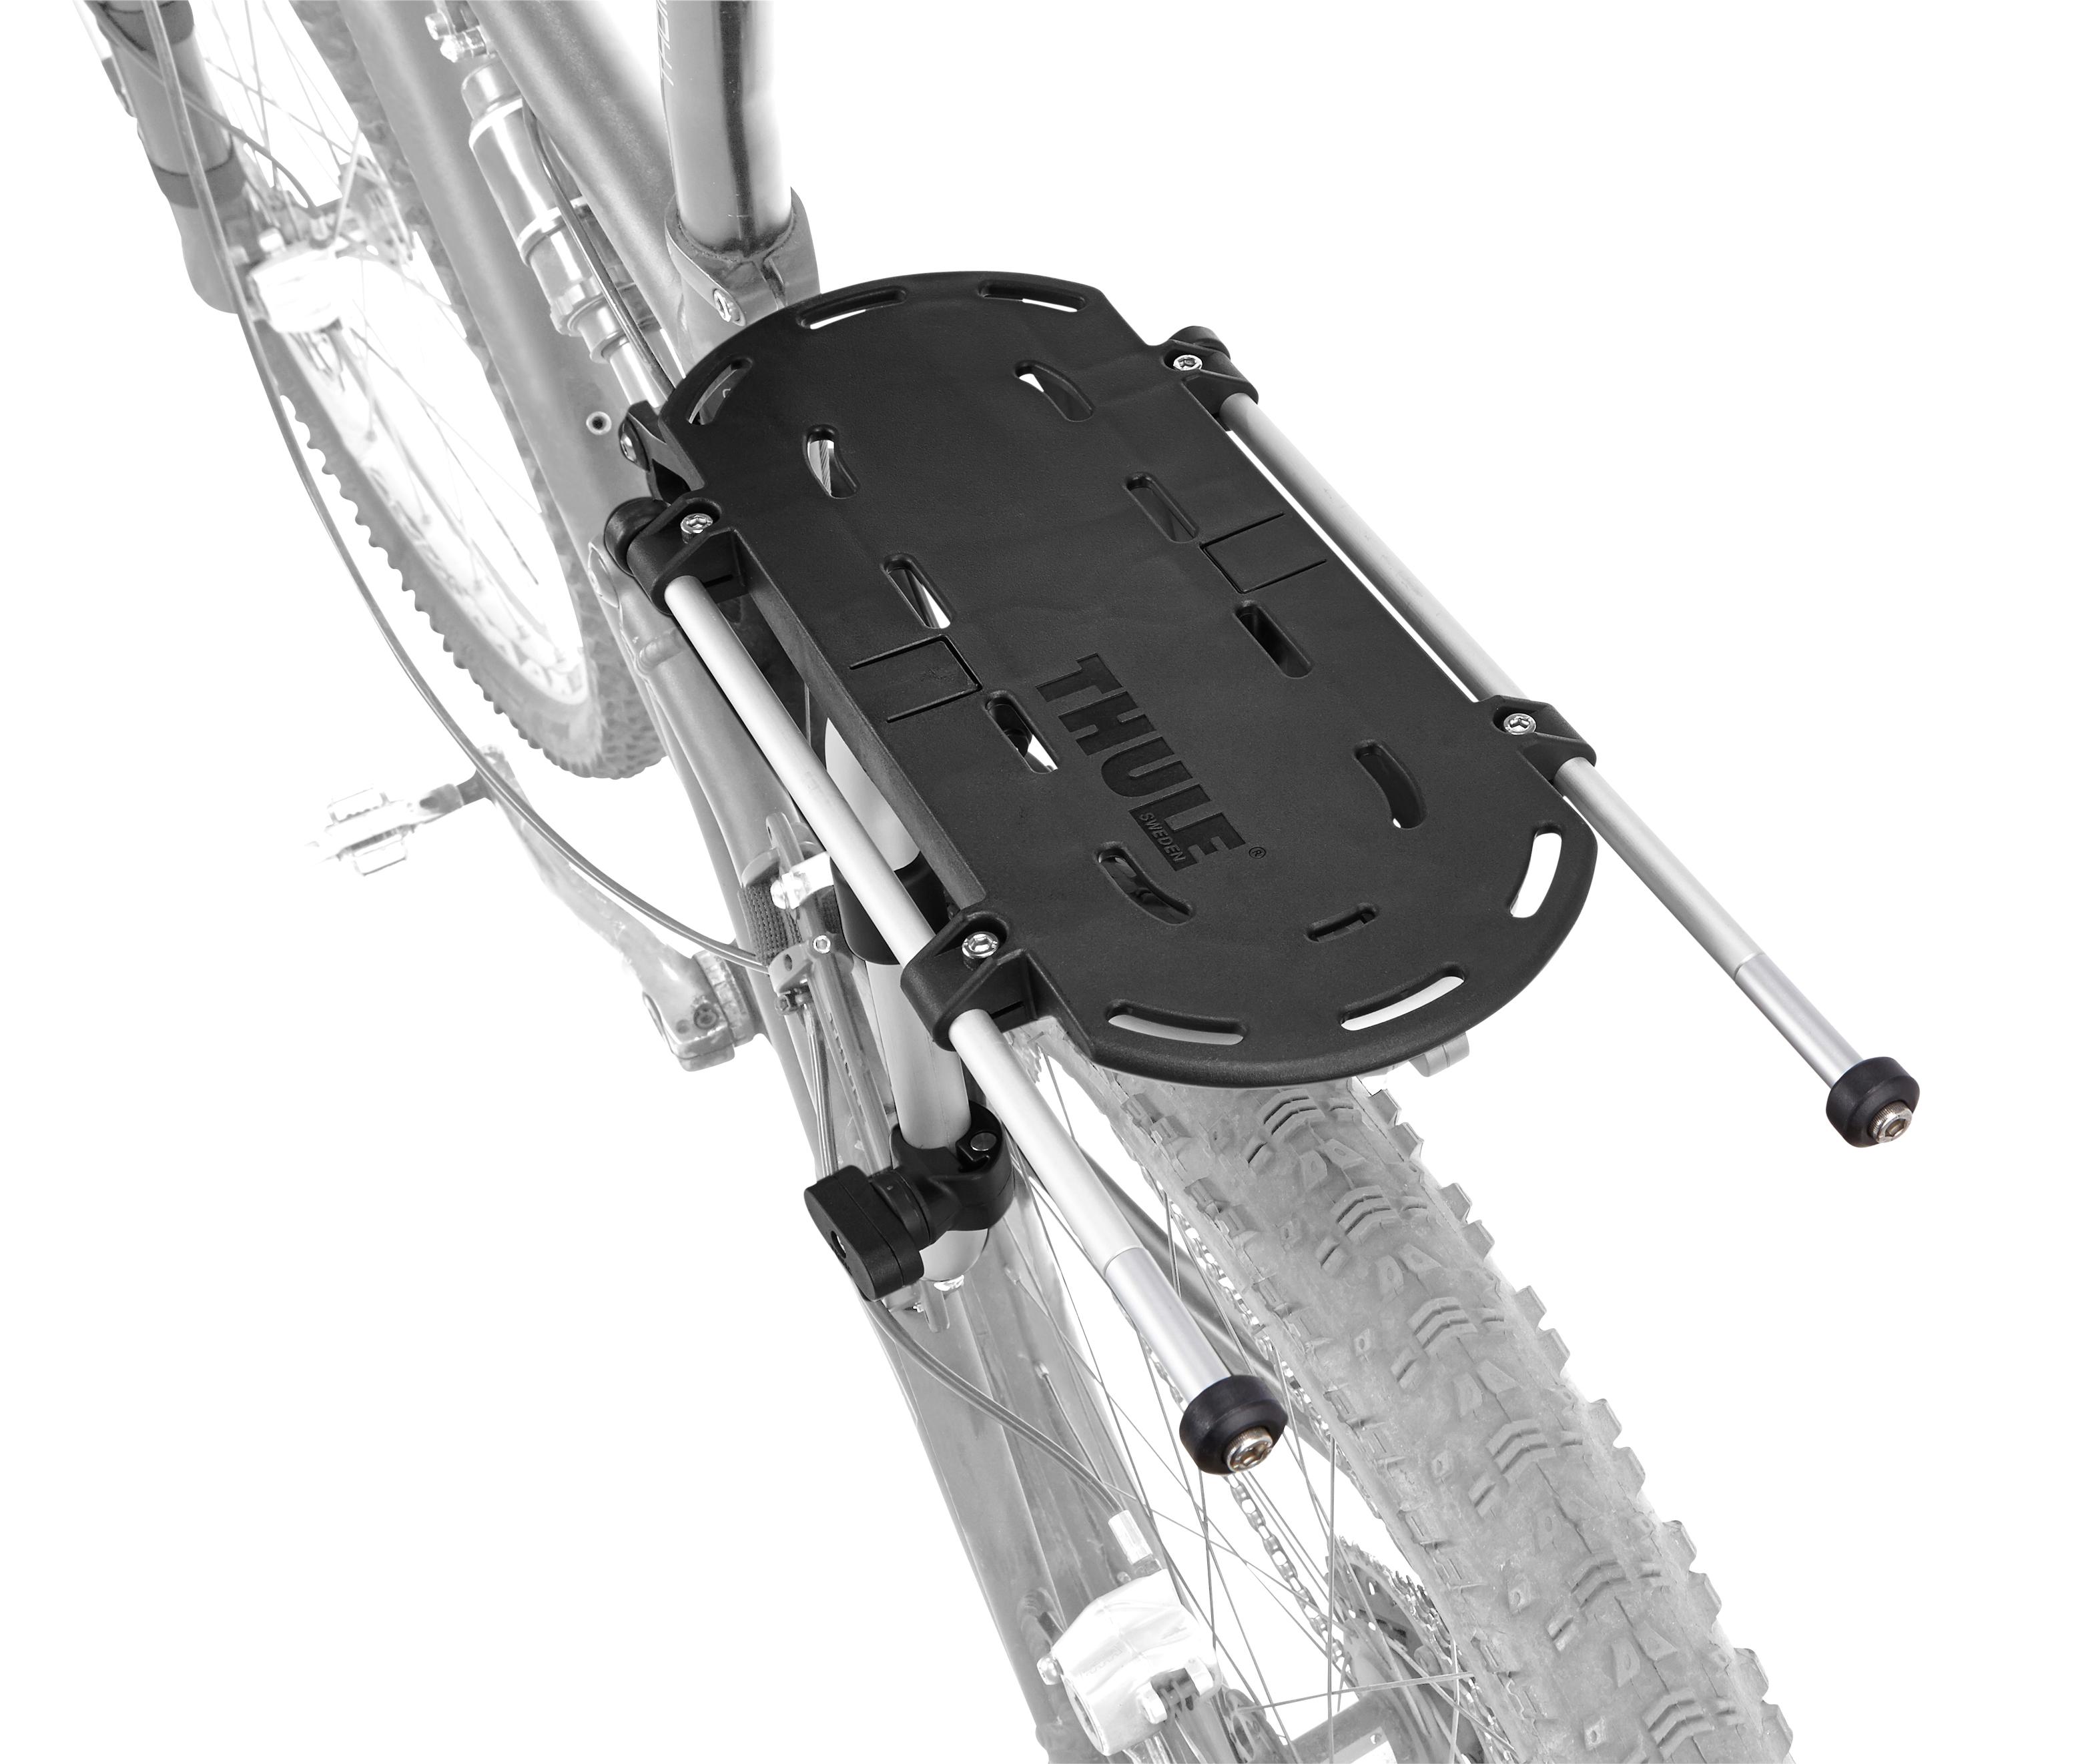 31cc218057a Thule Pack N Pedal Rail Extender Kit